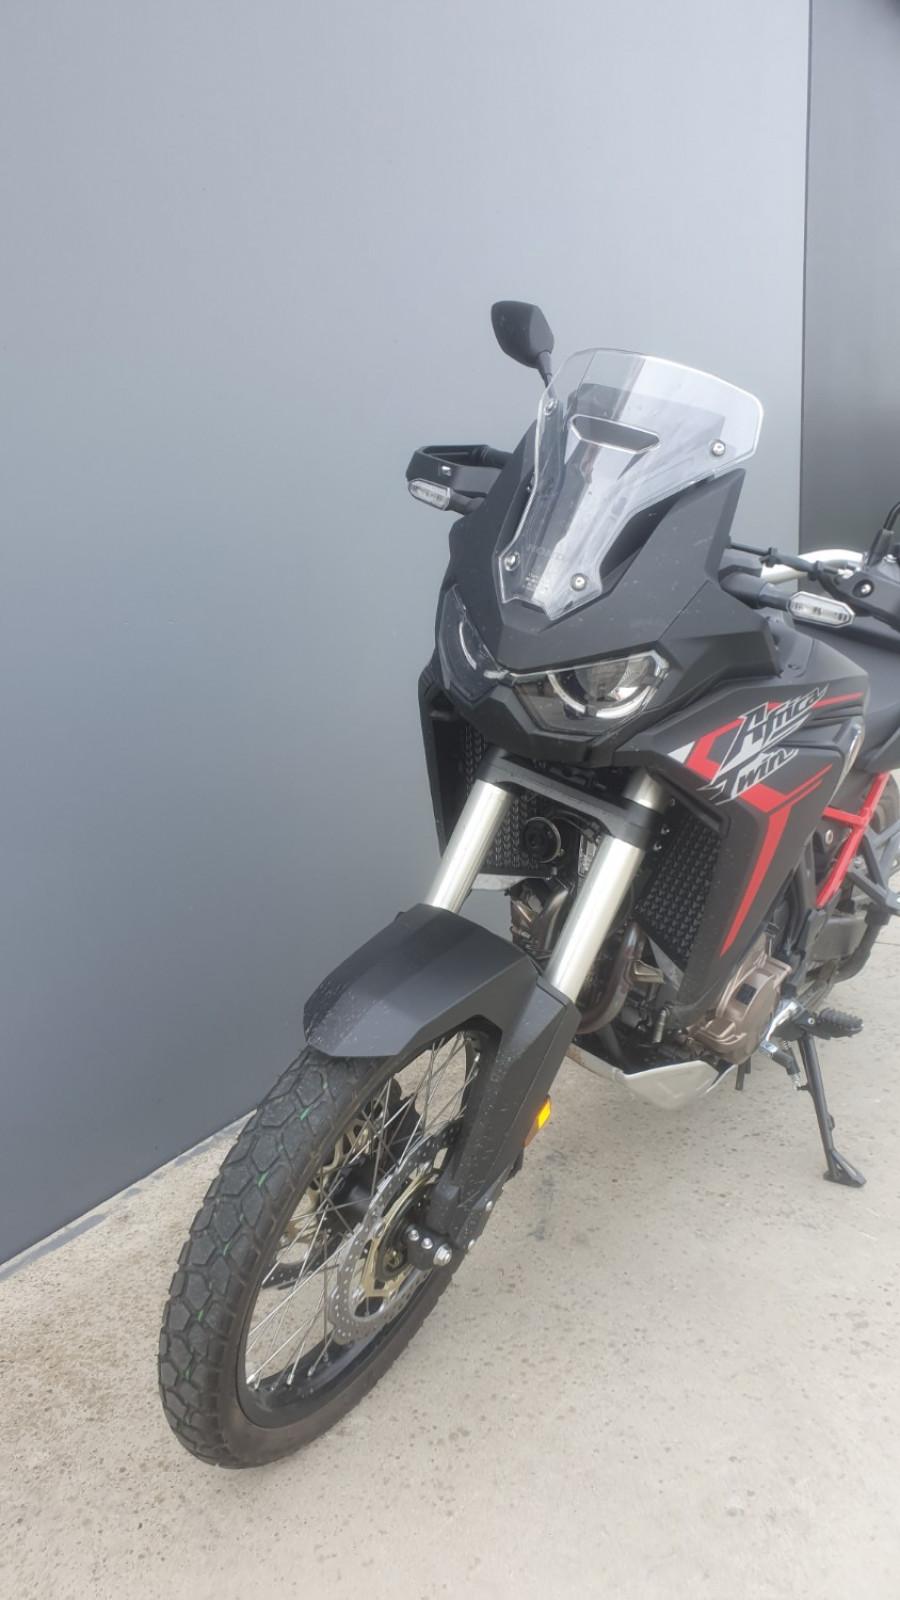 2020 Honda CRF1100AL2 TEMP 2020 Africa Twin Motorcycle Image 22